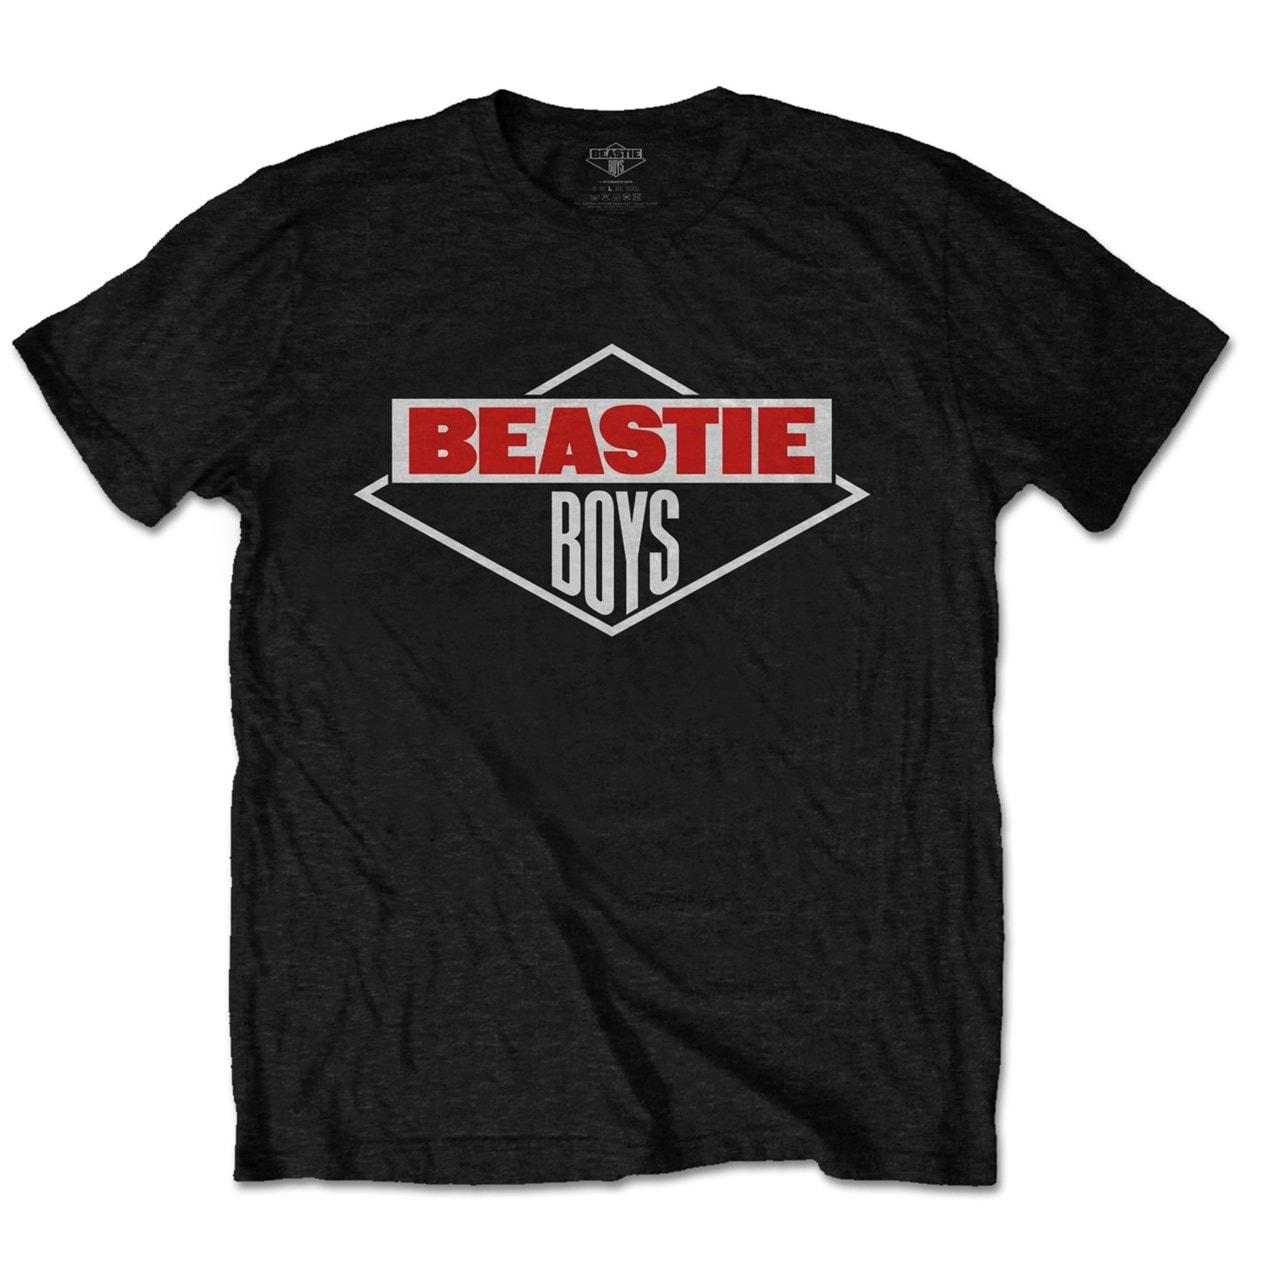 Beastie Boys: Logo (Small) - 1